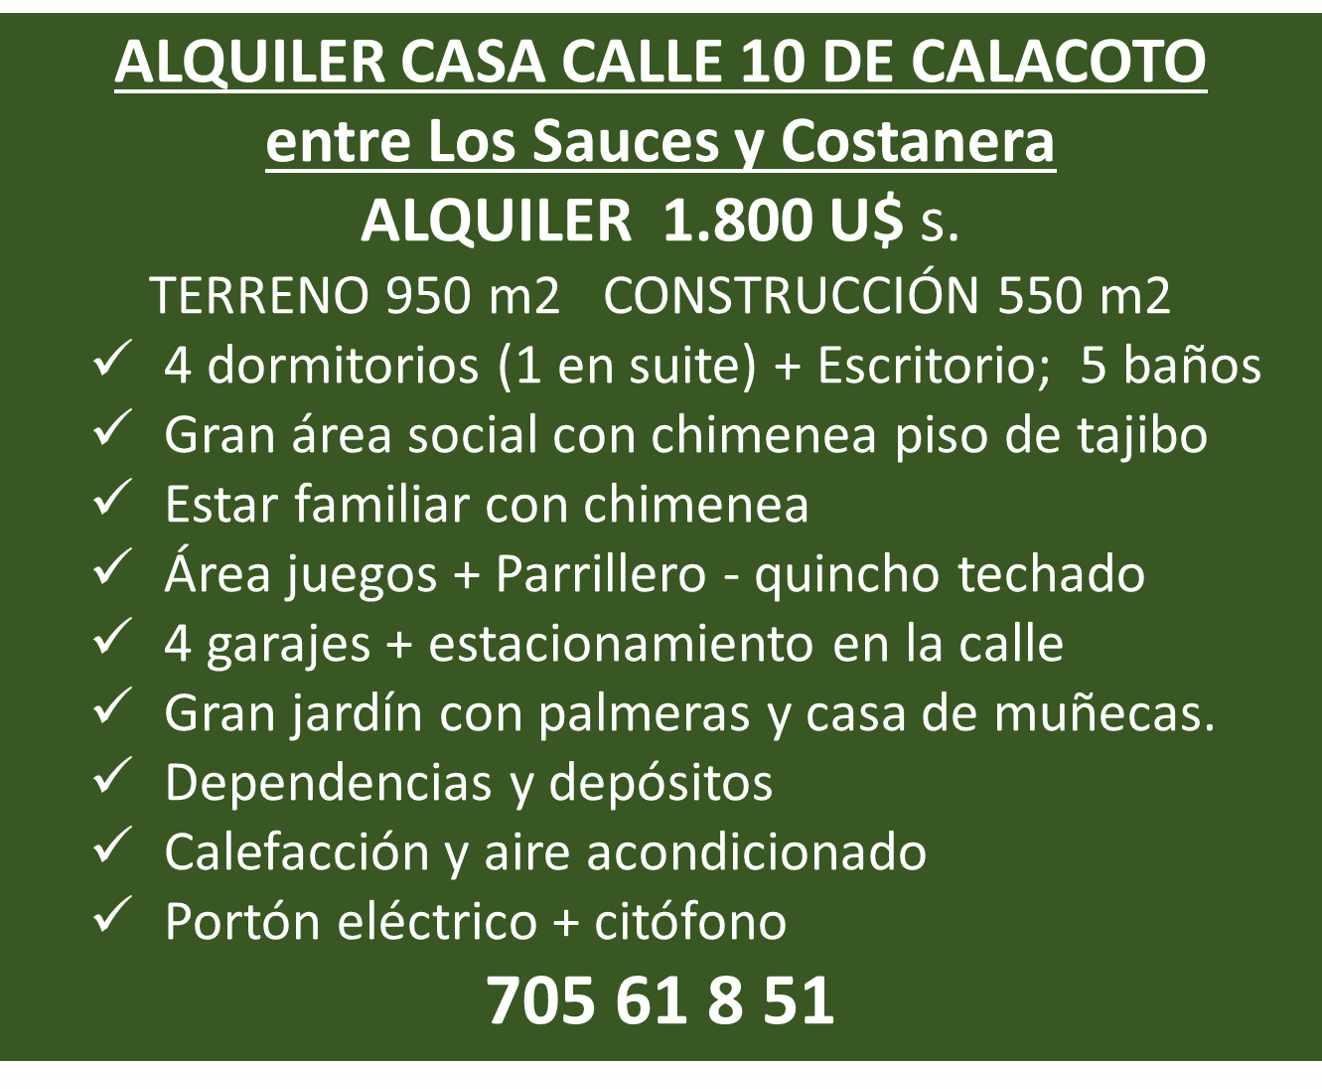 Casa en Alquiler Calle 10 de Calacoto casi esq. Costanera Foto 1